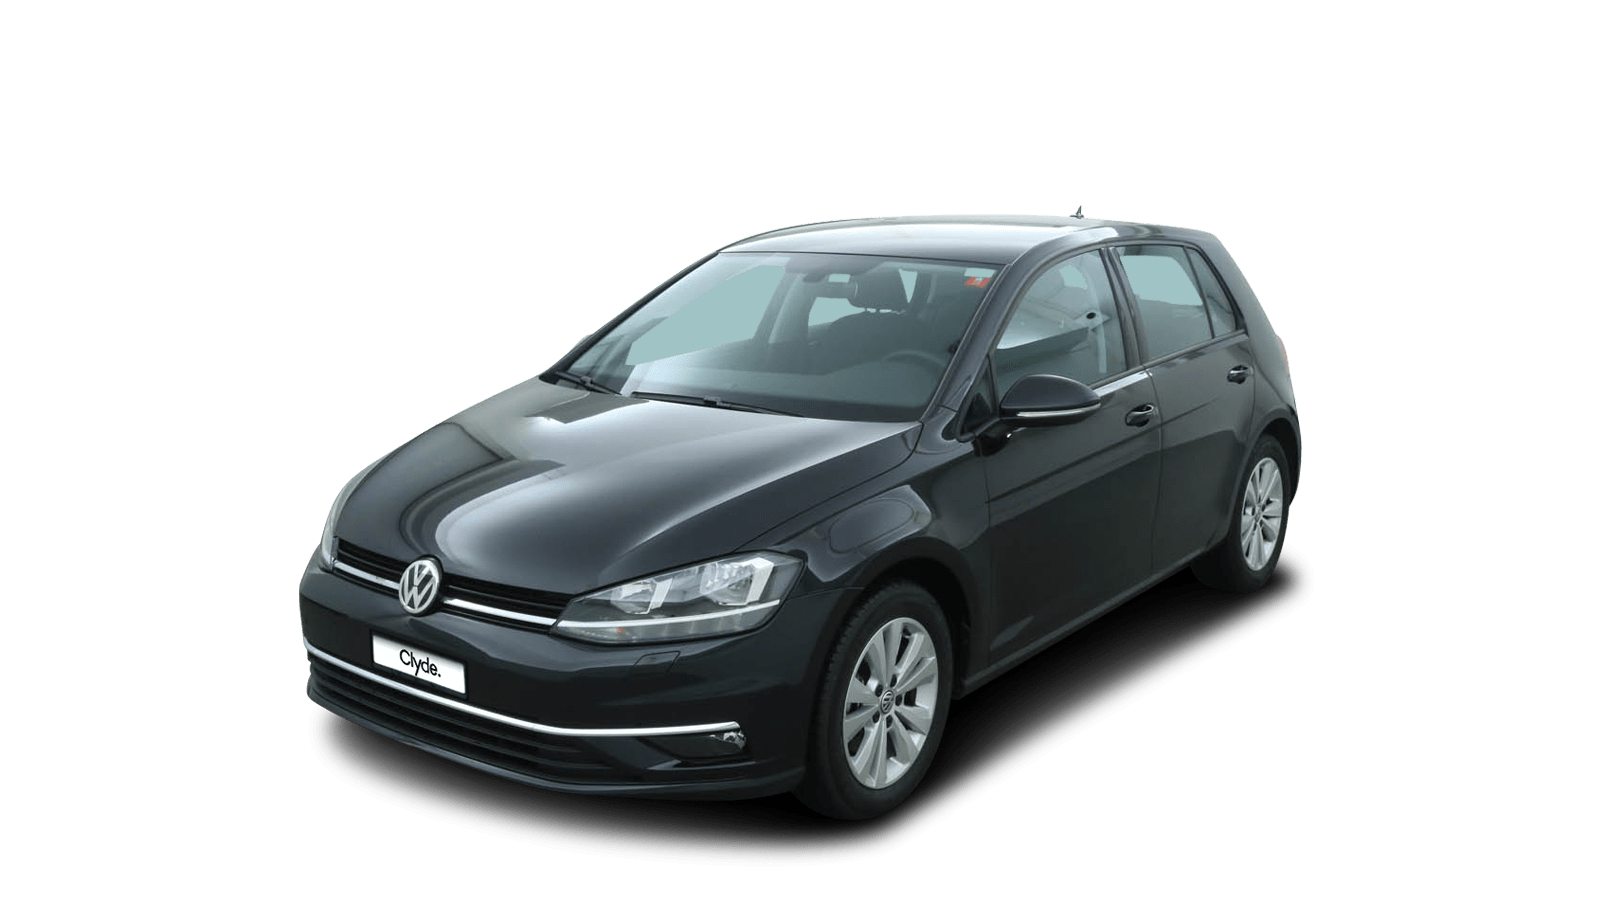 VW Golf Schwarz front - Clyde Auto-Abo